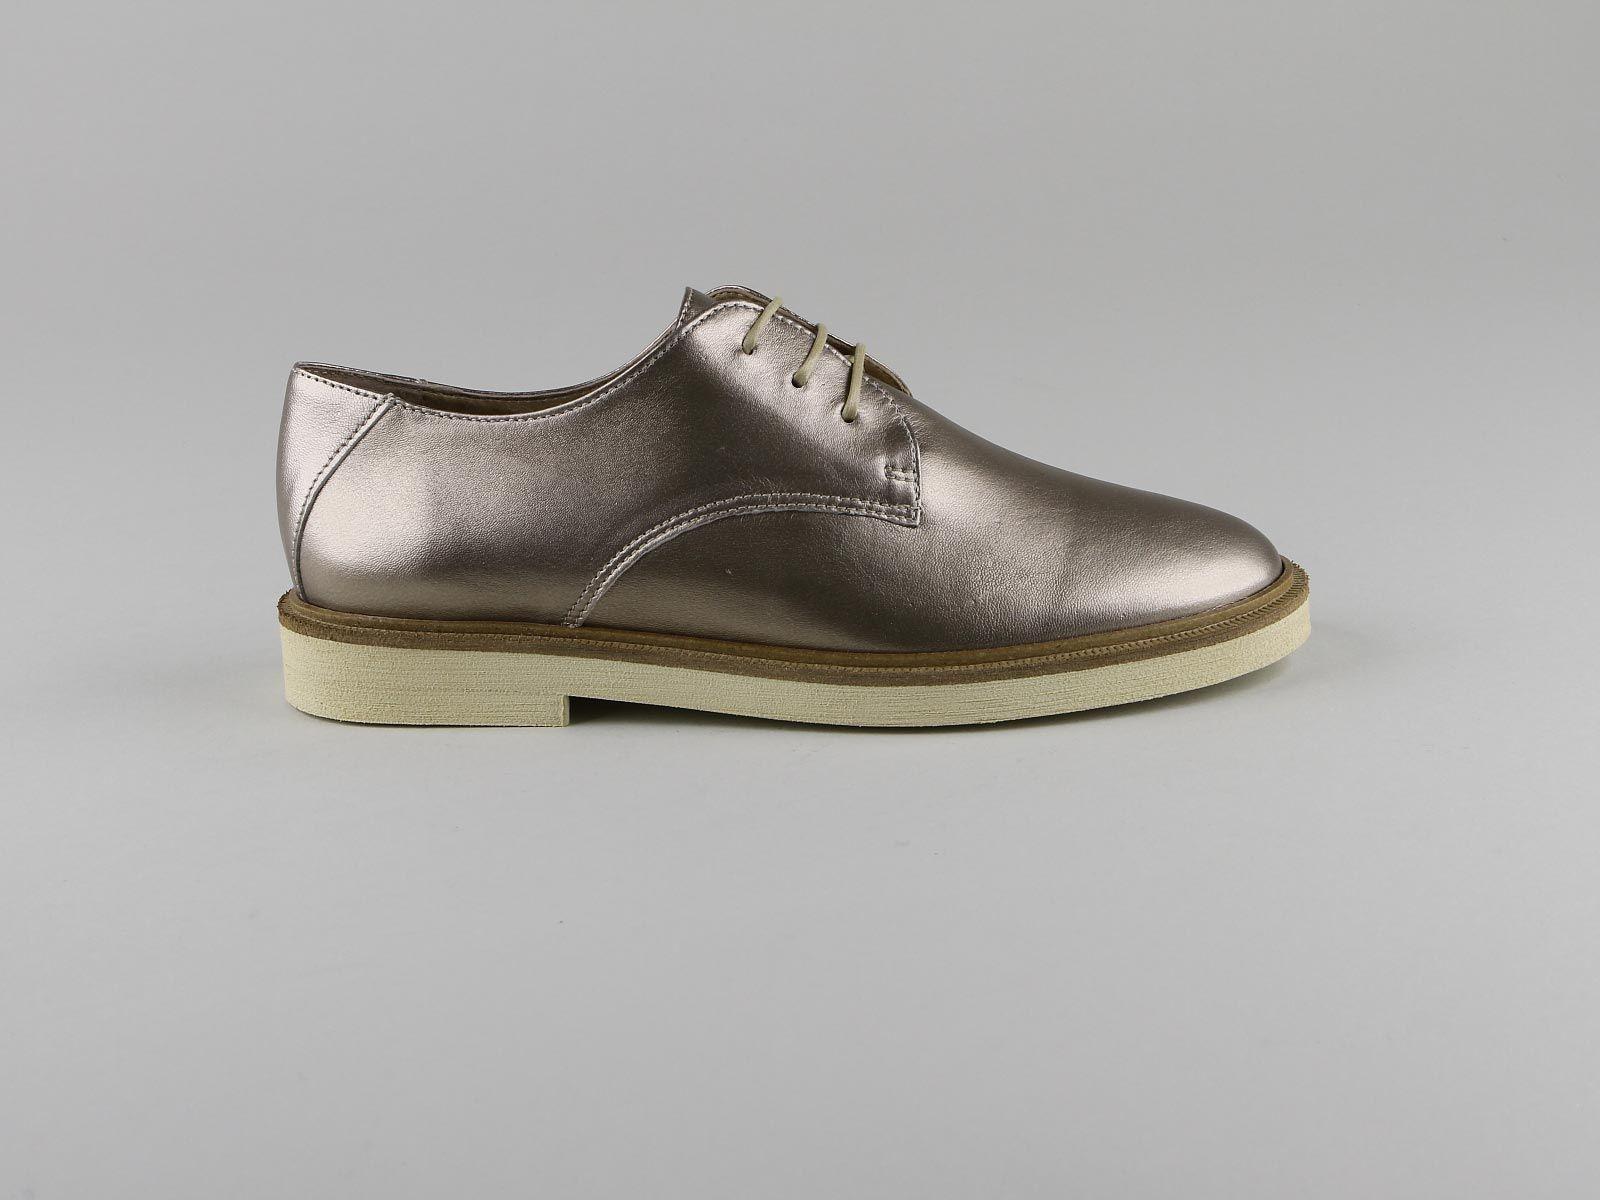 Schmoove Héroïne MALICE DERBY - Chaussures Femme - Lacets ... 1eba4e94e9e9